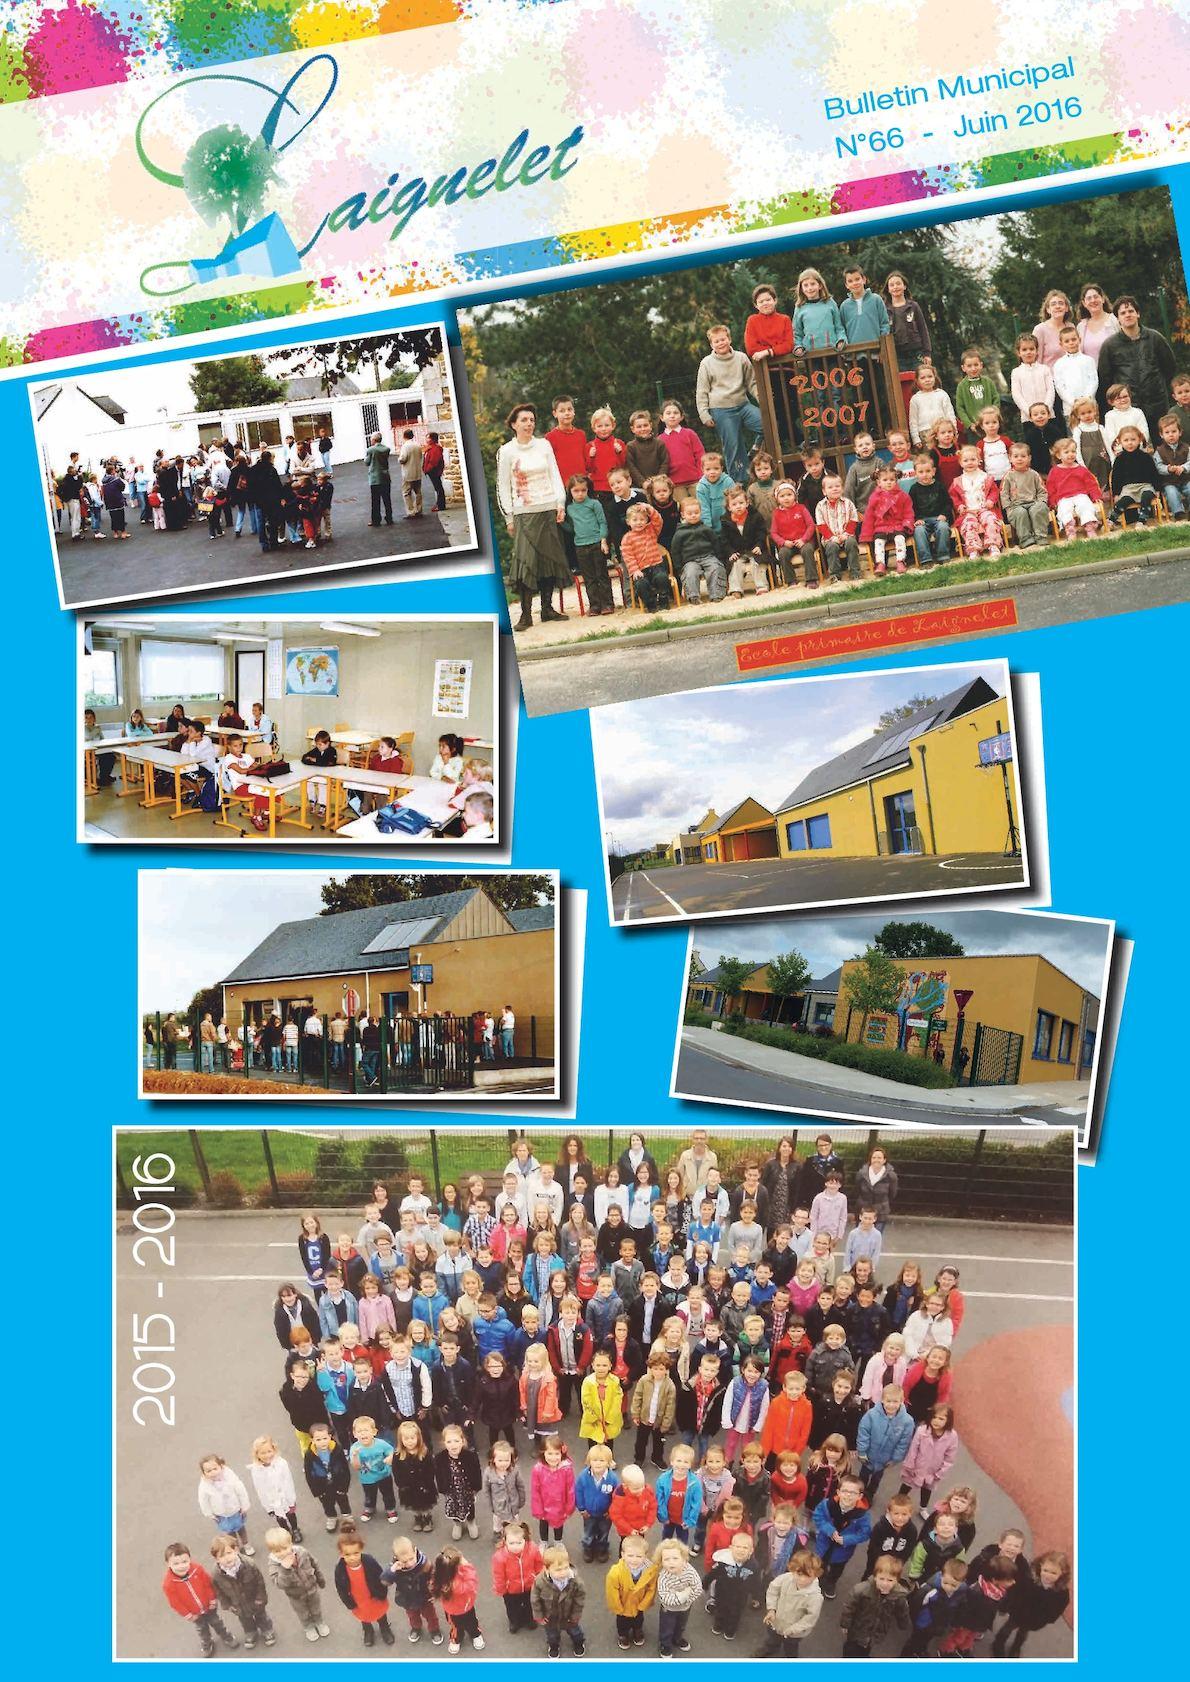 Tirage Du Loto Du 25 Juin 2016 : tirage, Calamo, Laignelet, Bulletin